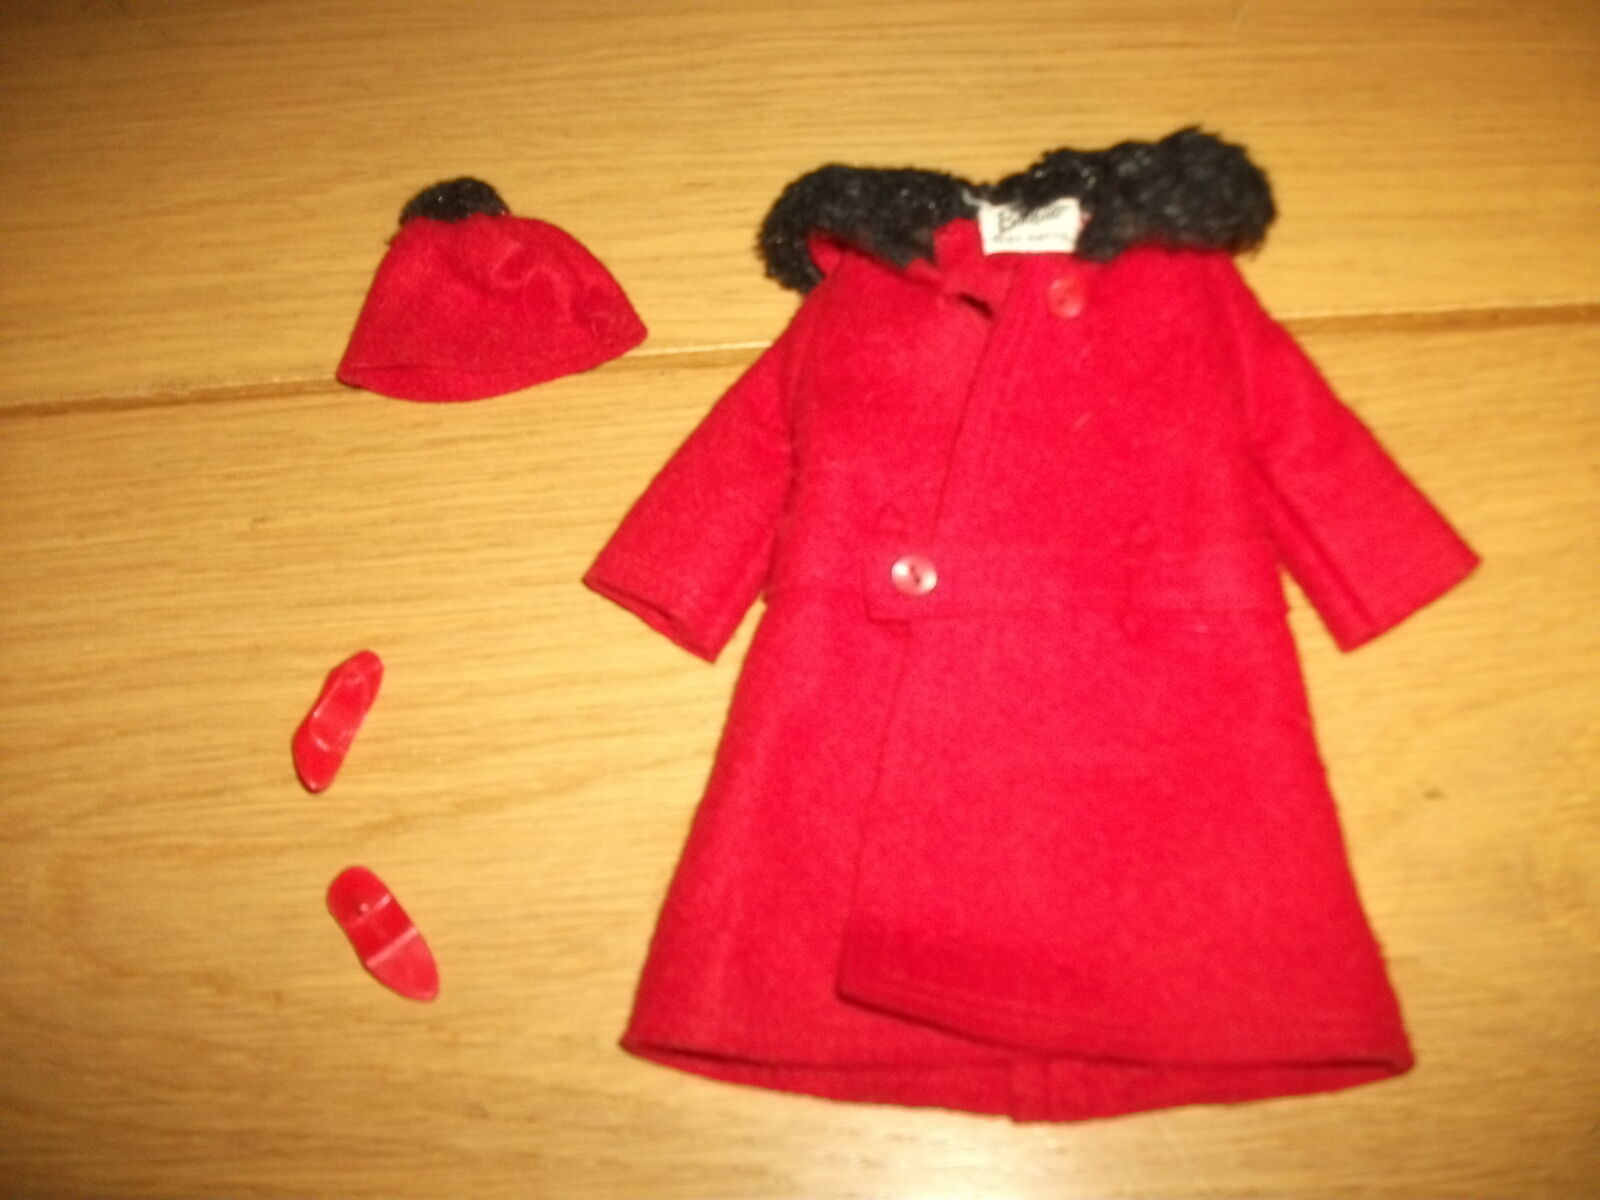 BARBIE-VINTAGE-Outfit n. 0819-rojo. version 60 anni lui